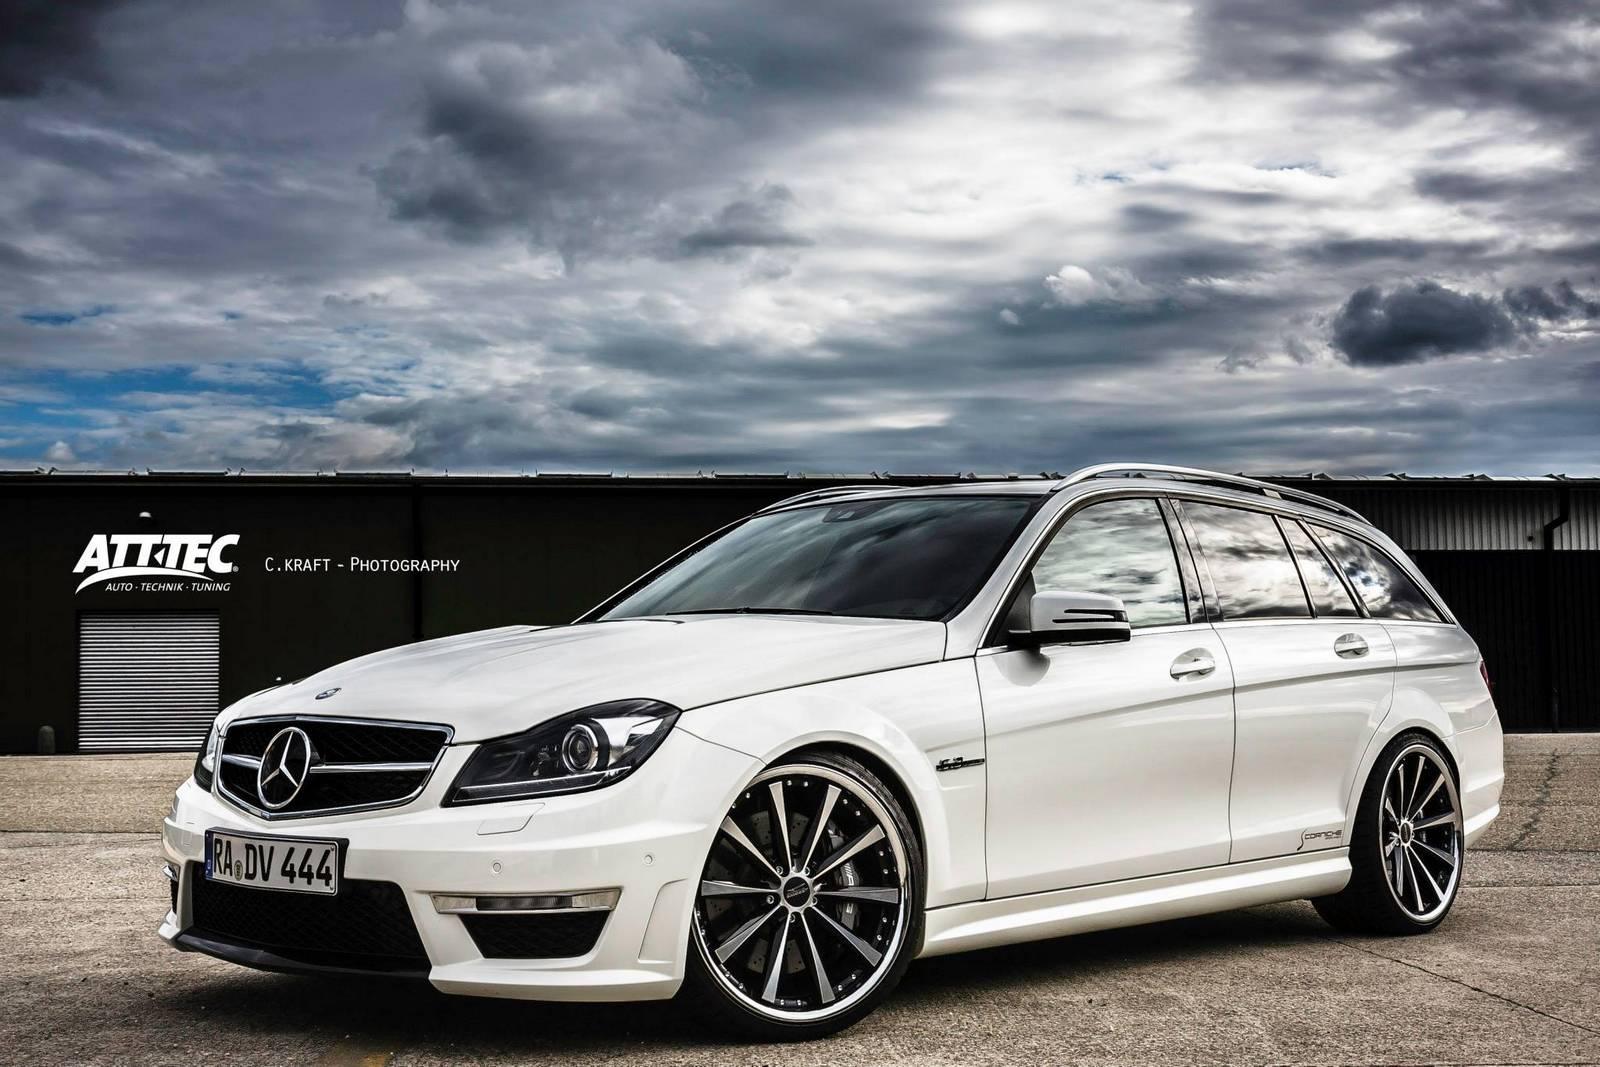 Mercedes benz c 63 amg estate by att tec gmbh gtspirit for Mercedes benz c550 for sale